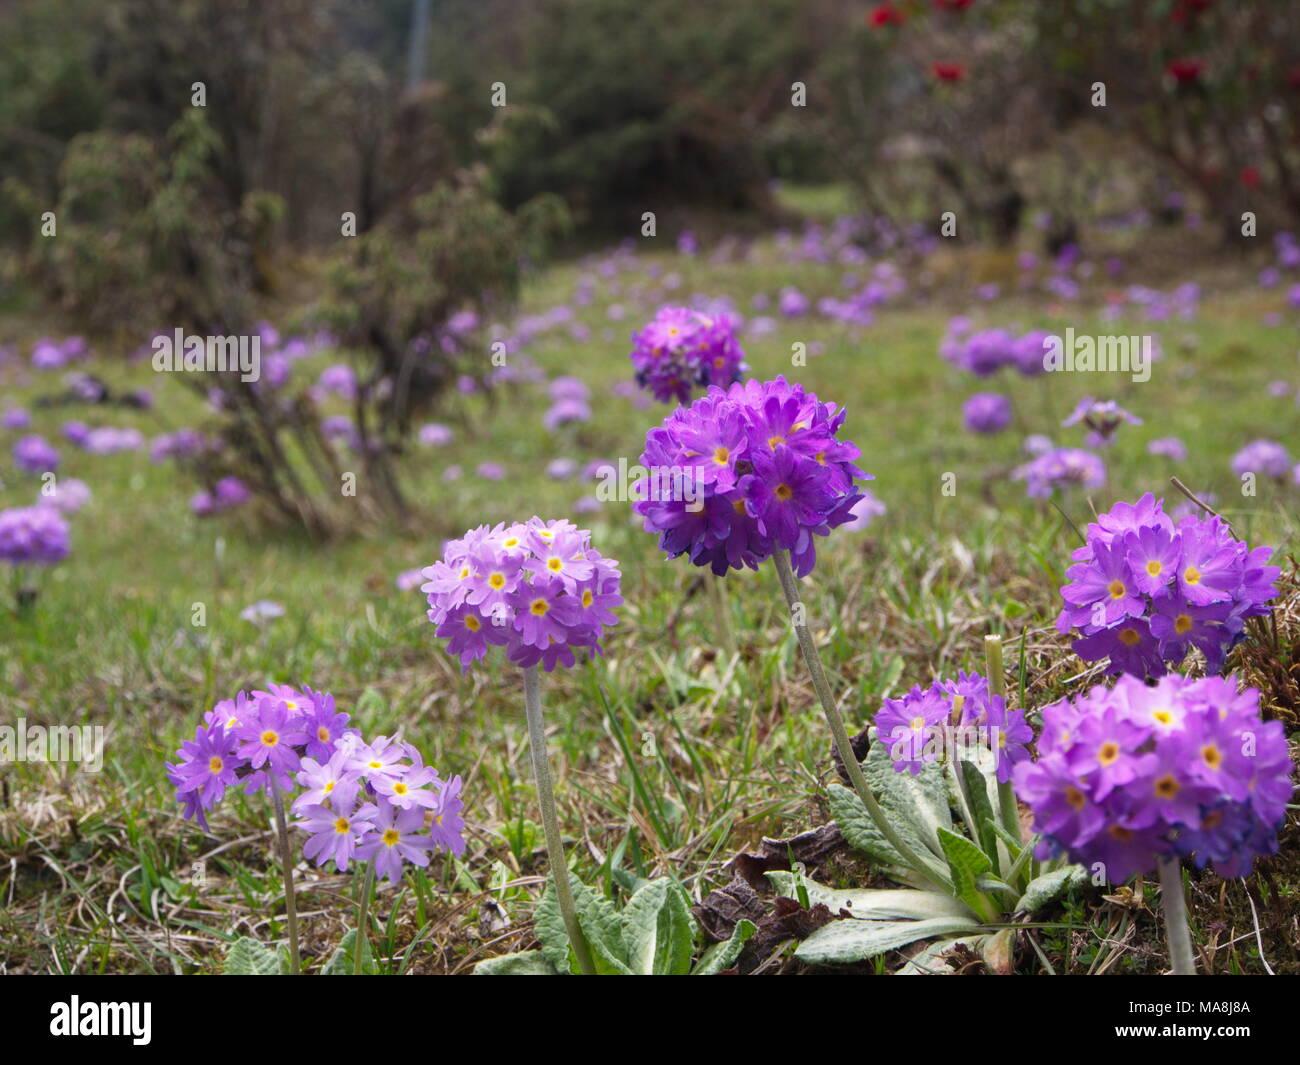 Old Fashioned Beautiful Flower India Arie Lyrics Frieze Images For